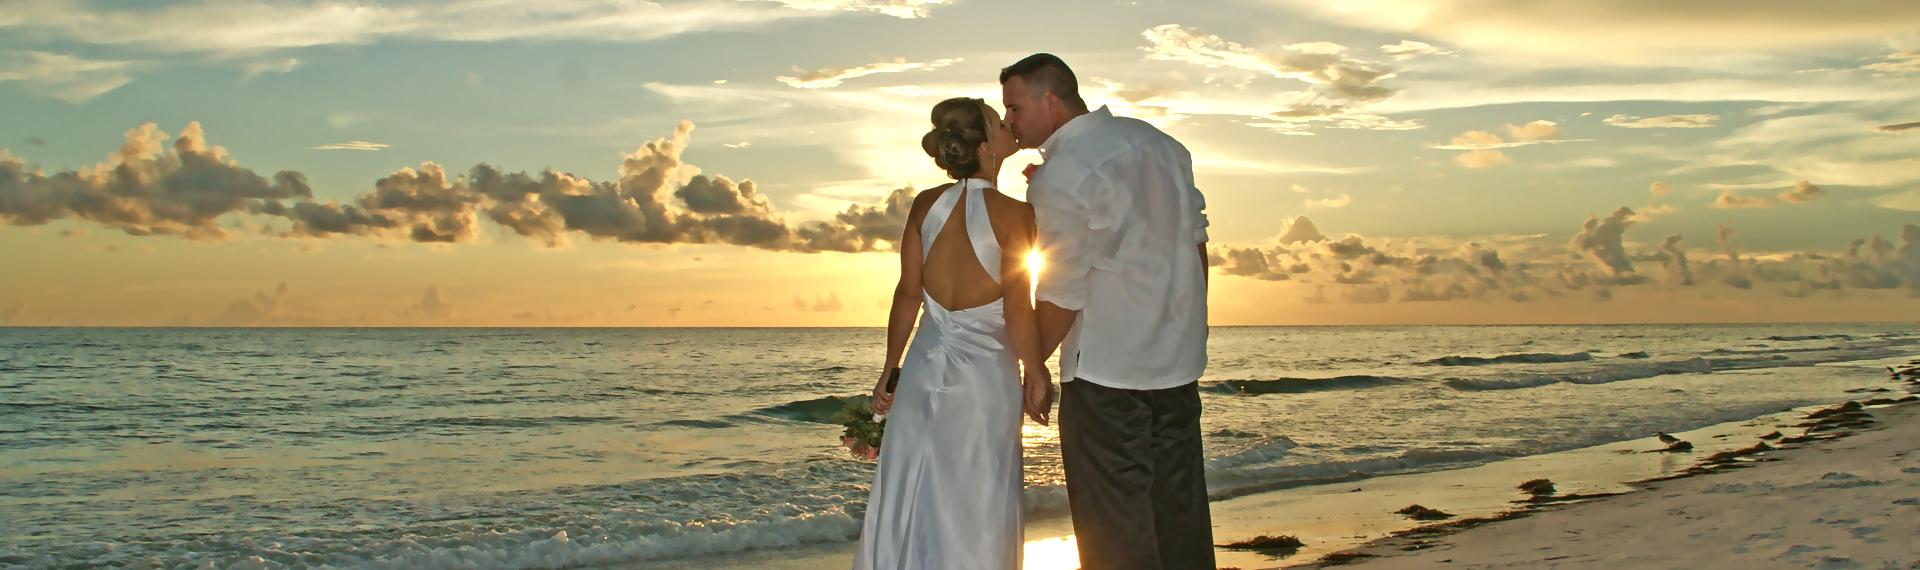 Sarasota Beach weddings by Lortz